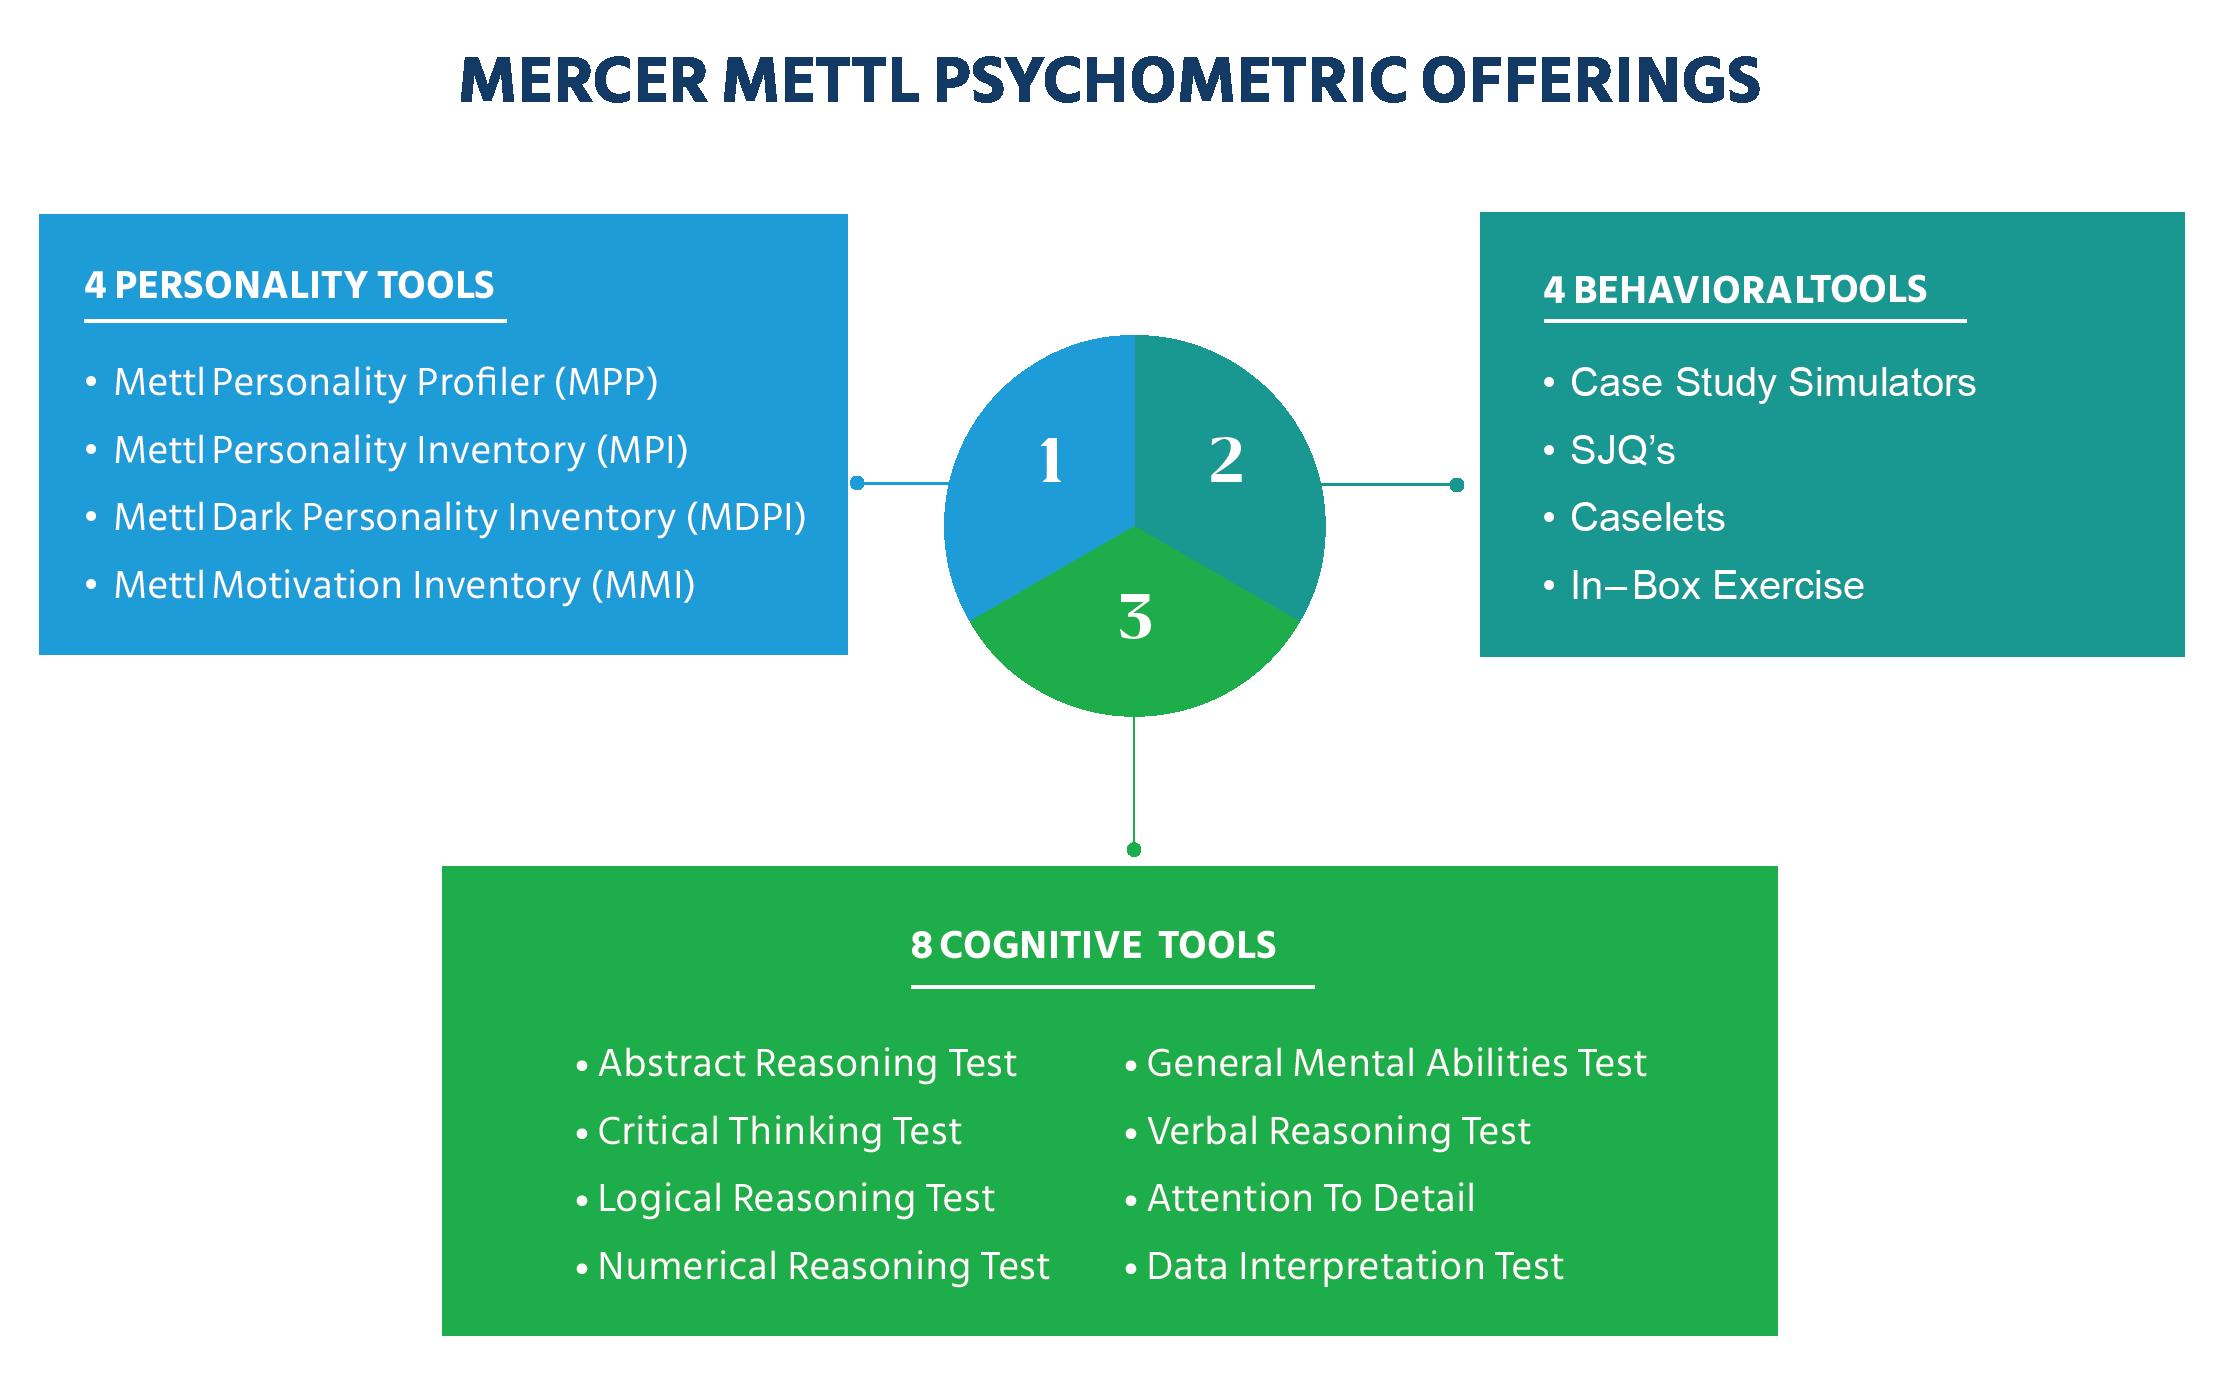 Mercer|Mettl's psychometric offerings